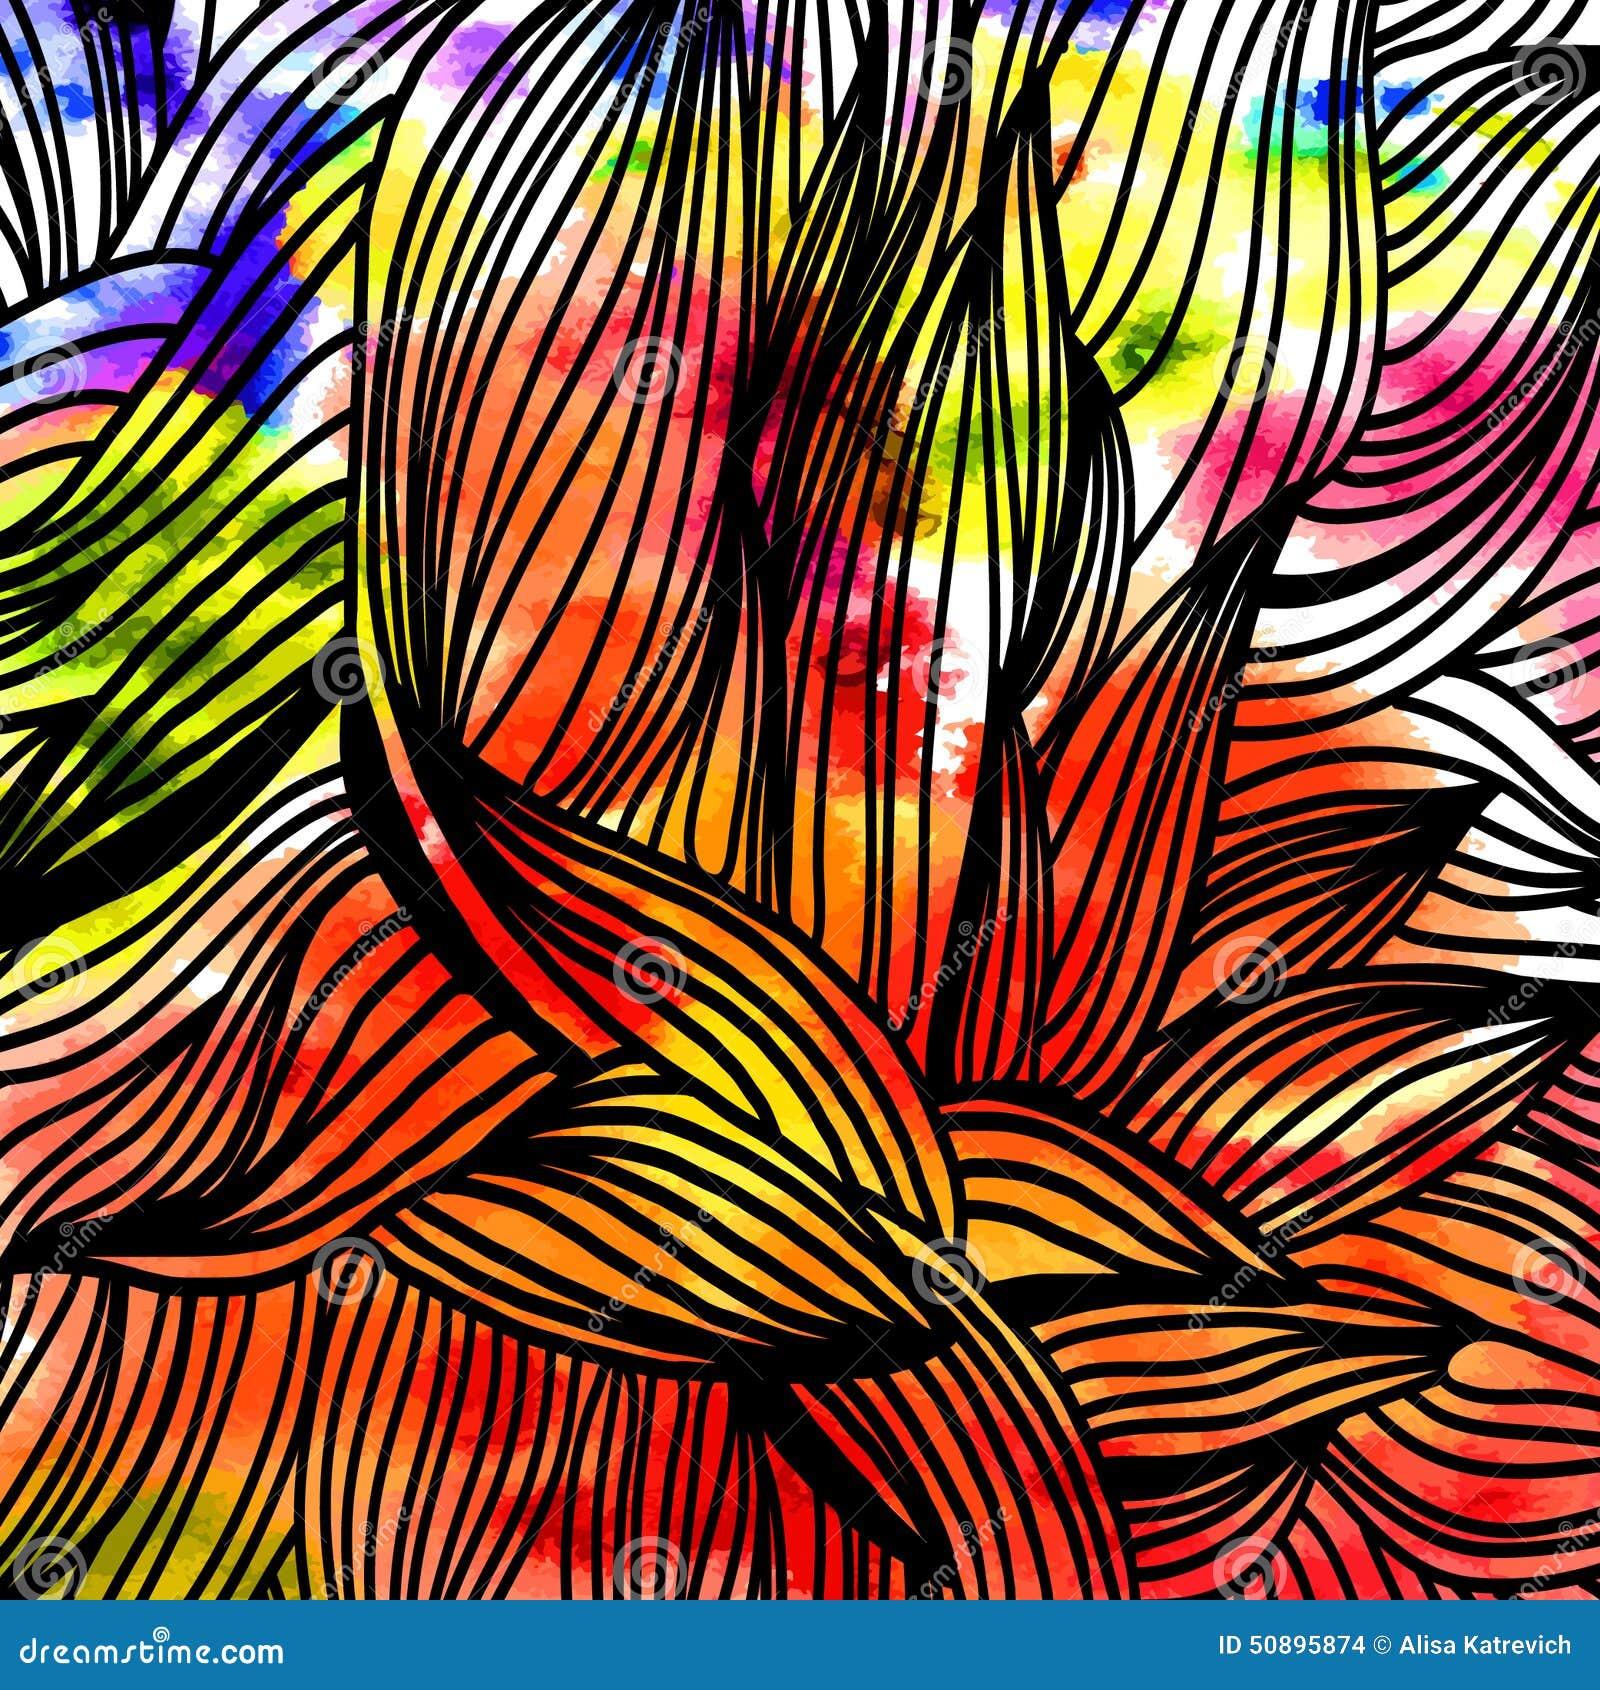 Beautiful Wallpaper Mountain Pattern - t-mountain-patterns-seamless-pattern-can-be-used-wallpaper-eps-50895874  Pictures_457874.jpg